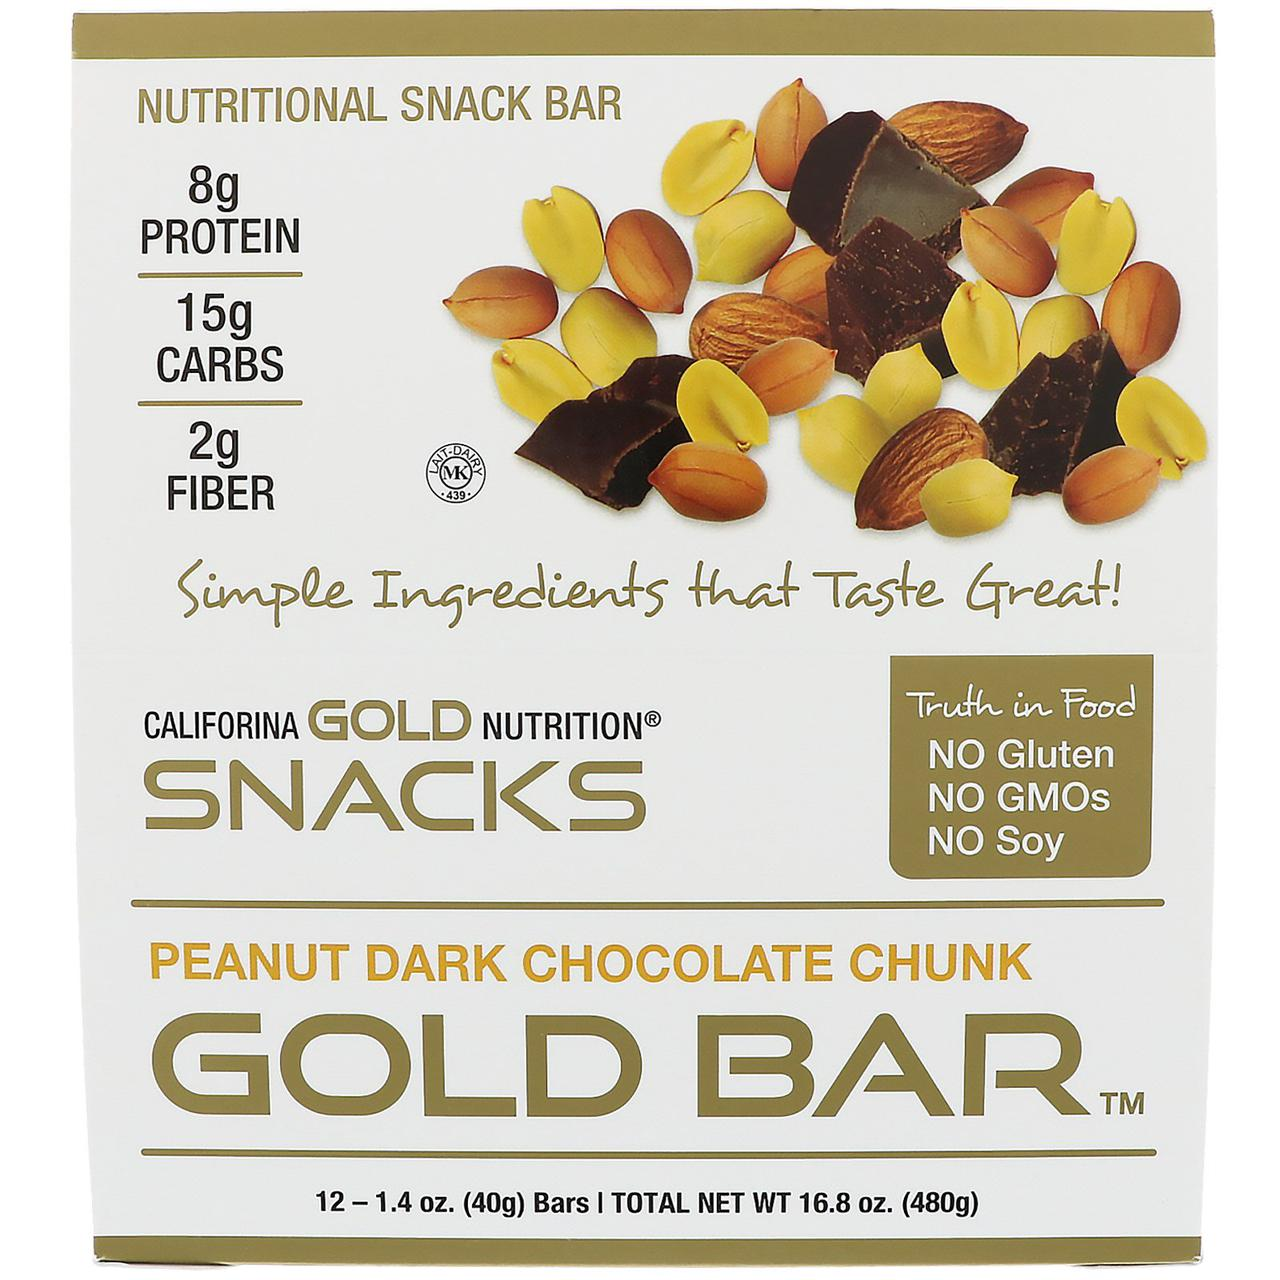 California Gold Nutrition, Gold Bar, Арахис и кусочки темного шоколада, 12 батончиков, 1,4 унц. (40 г) каждый